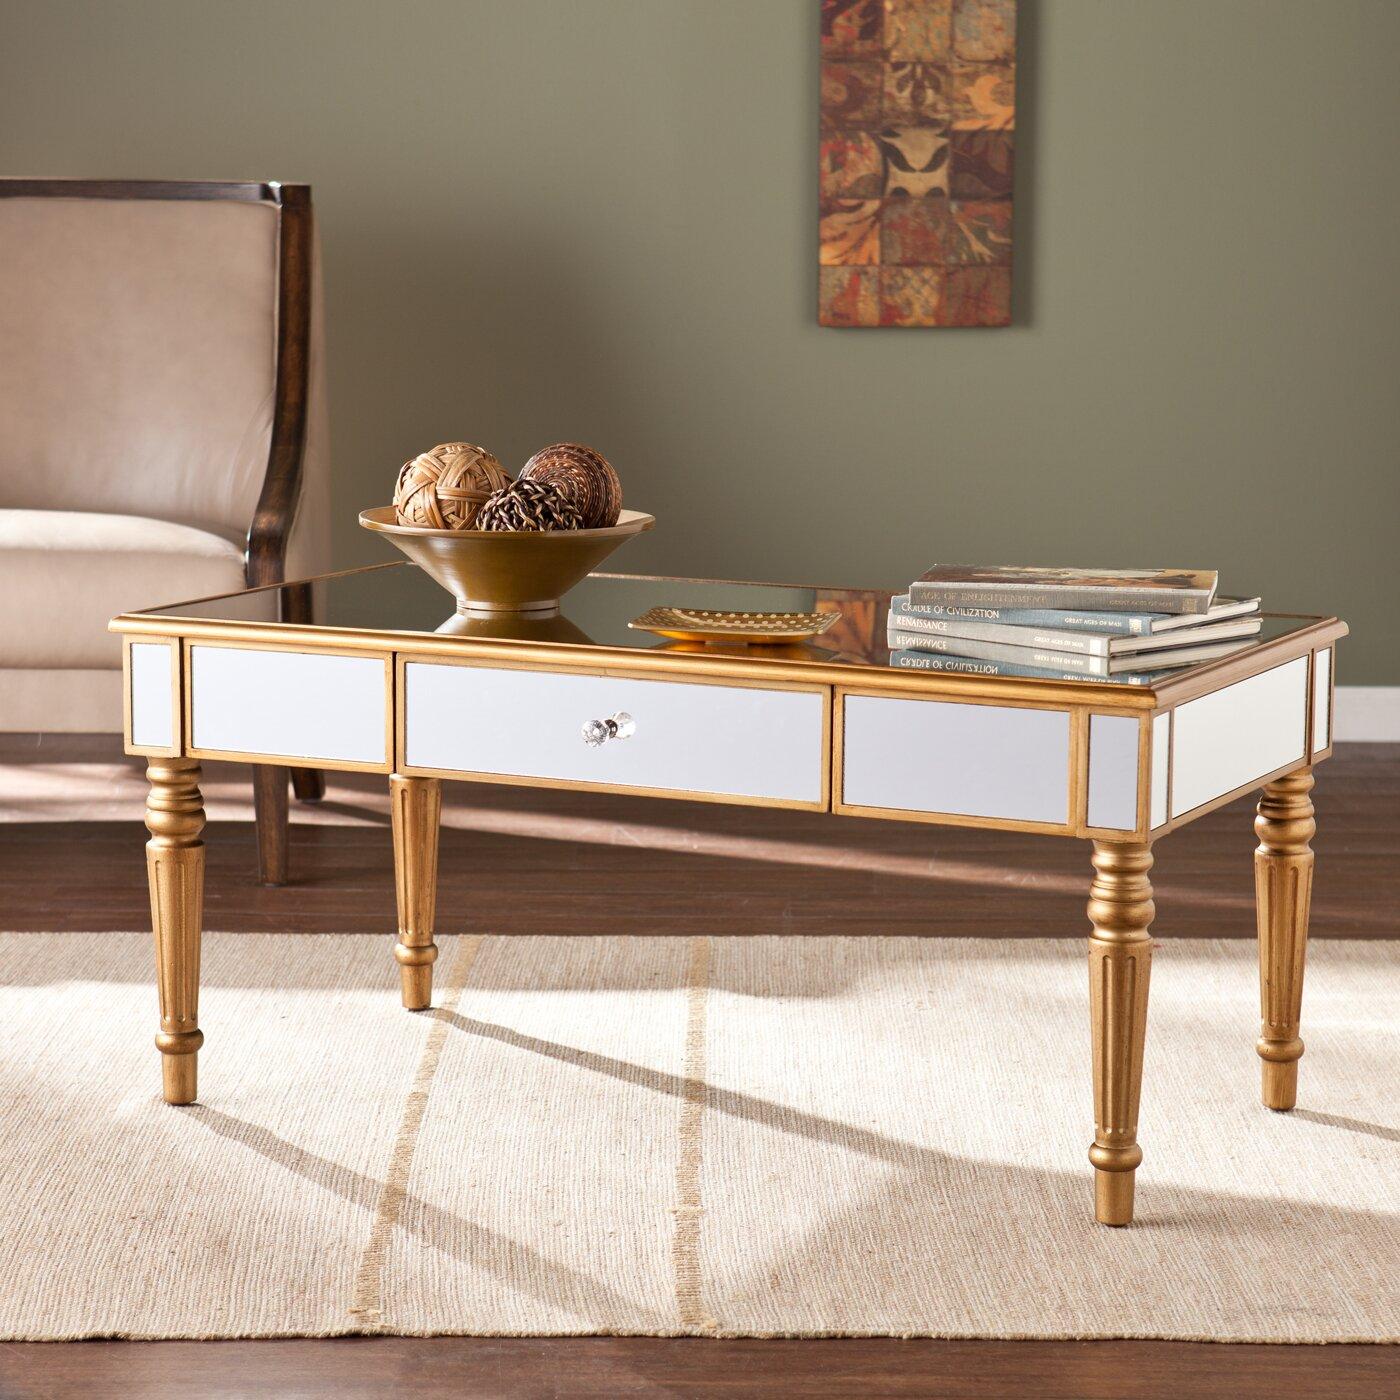 Wildon Home ® Huxley Mirrored Coffee Table & Reviews